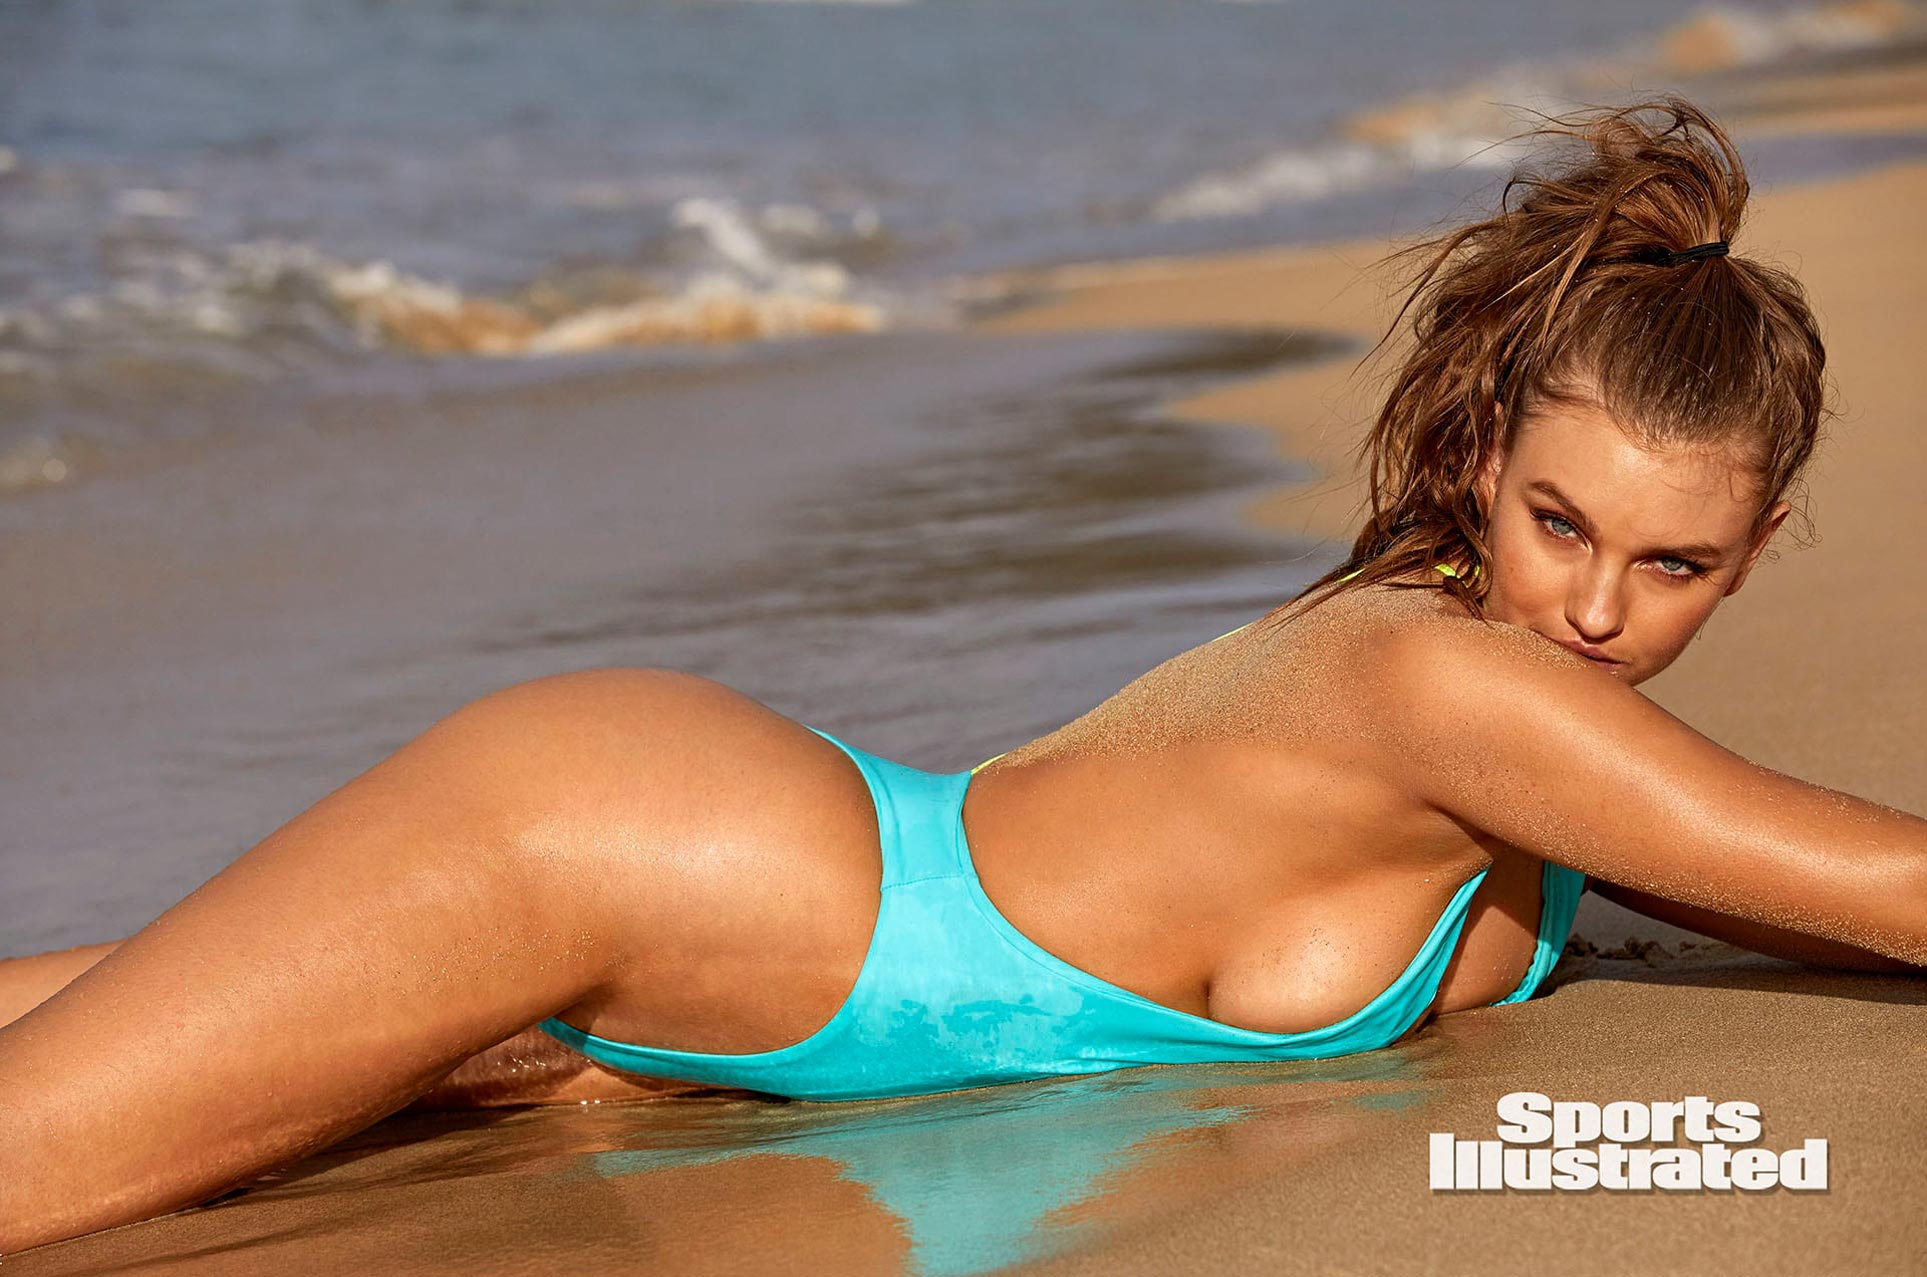 Оливия Брауэр в каталоге купальников Sports Illustrated Swimsuit 2020 / фото 10